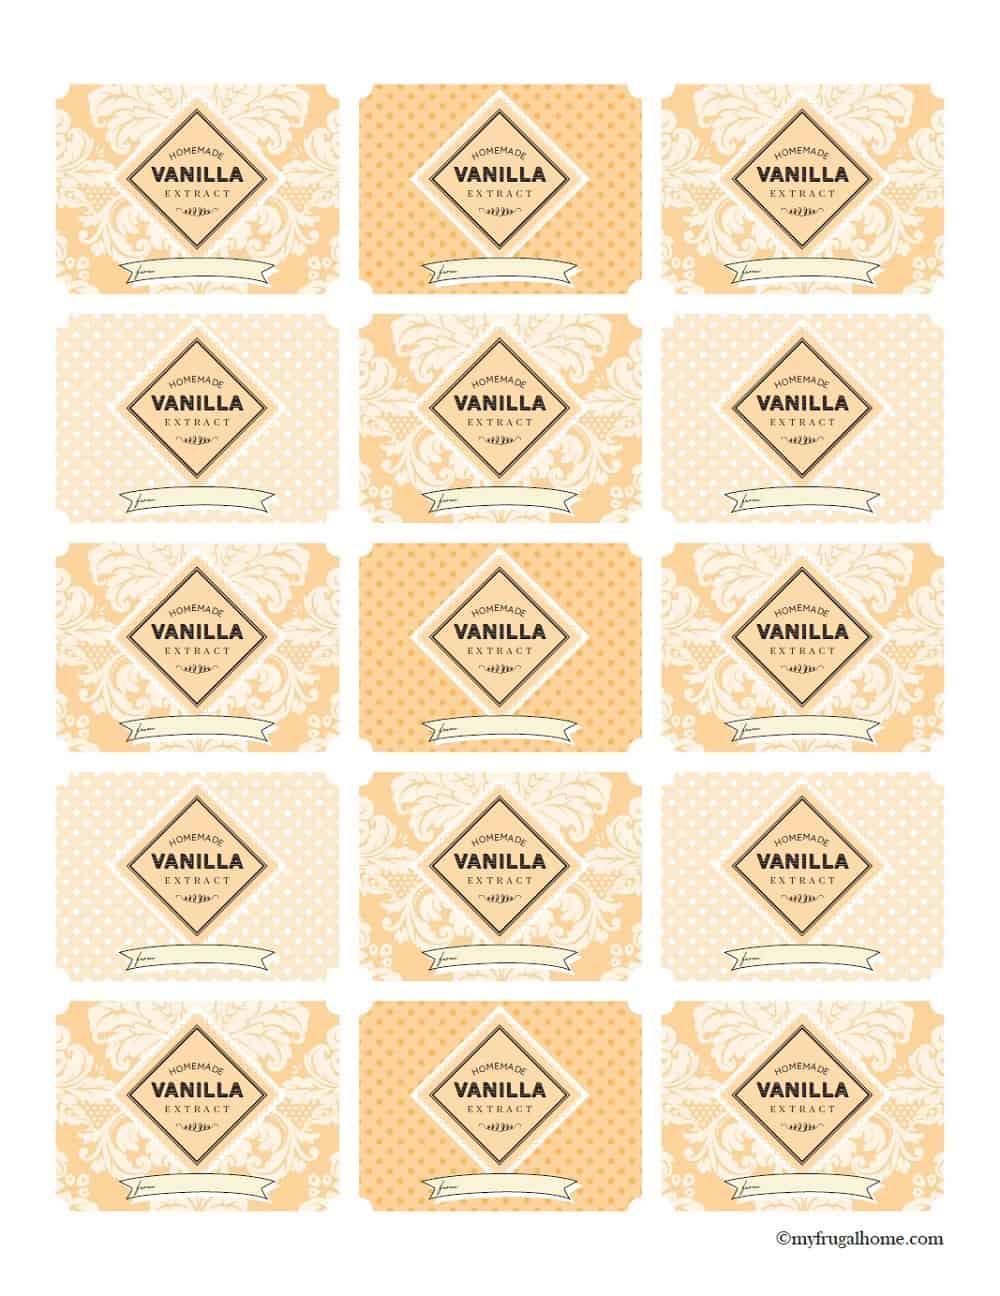 Printable Vanilla Extract Labels